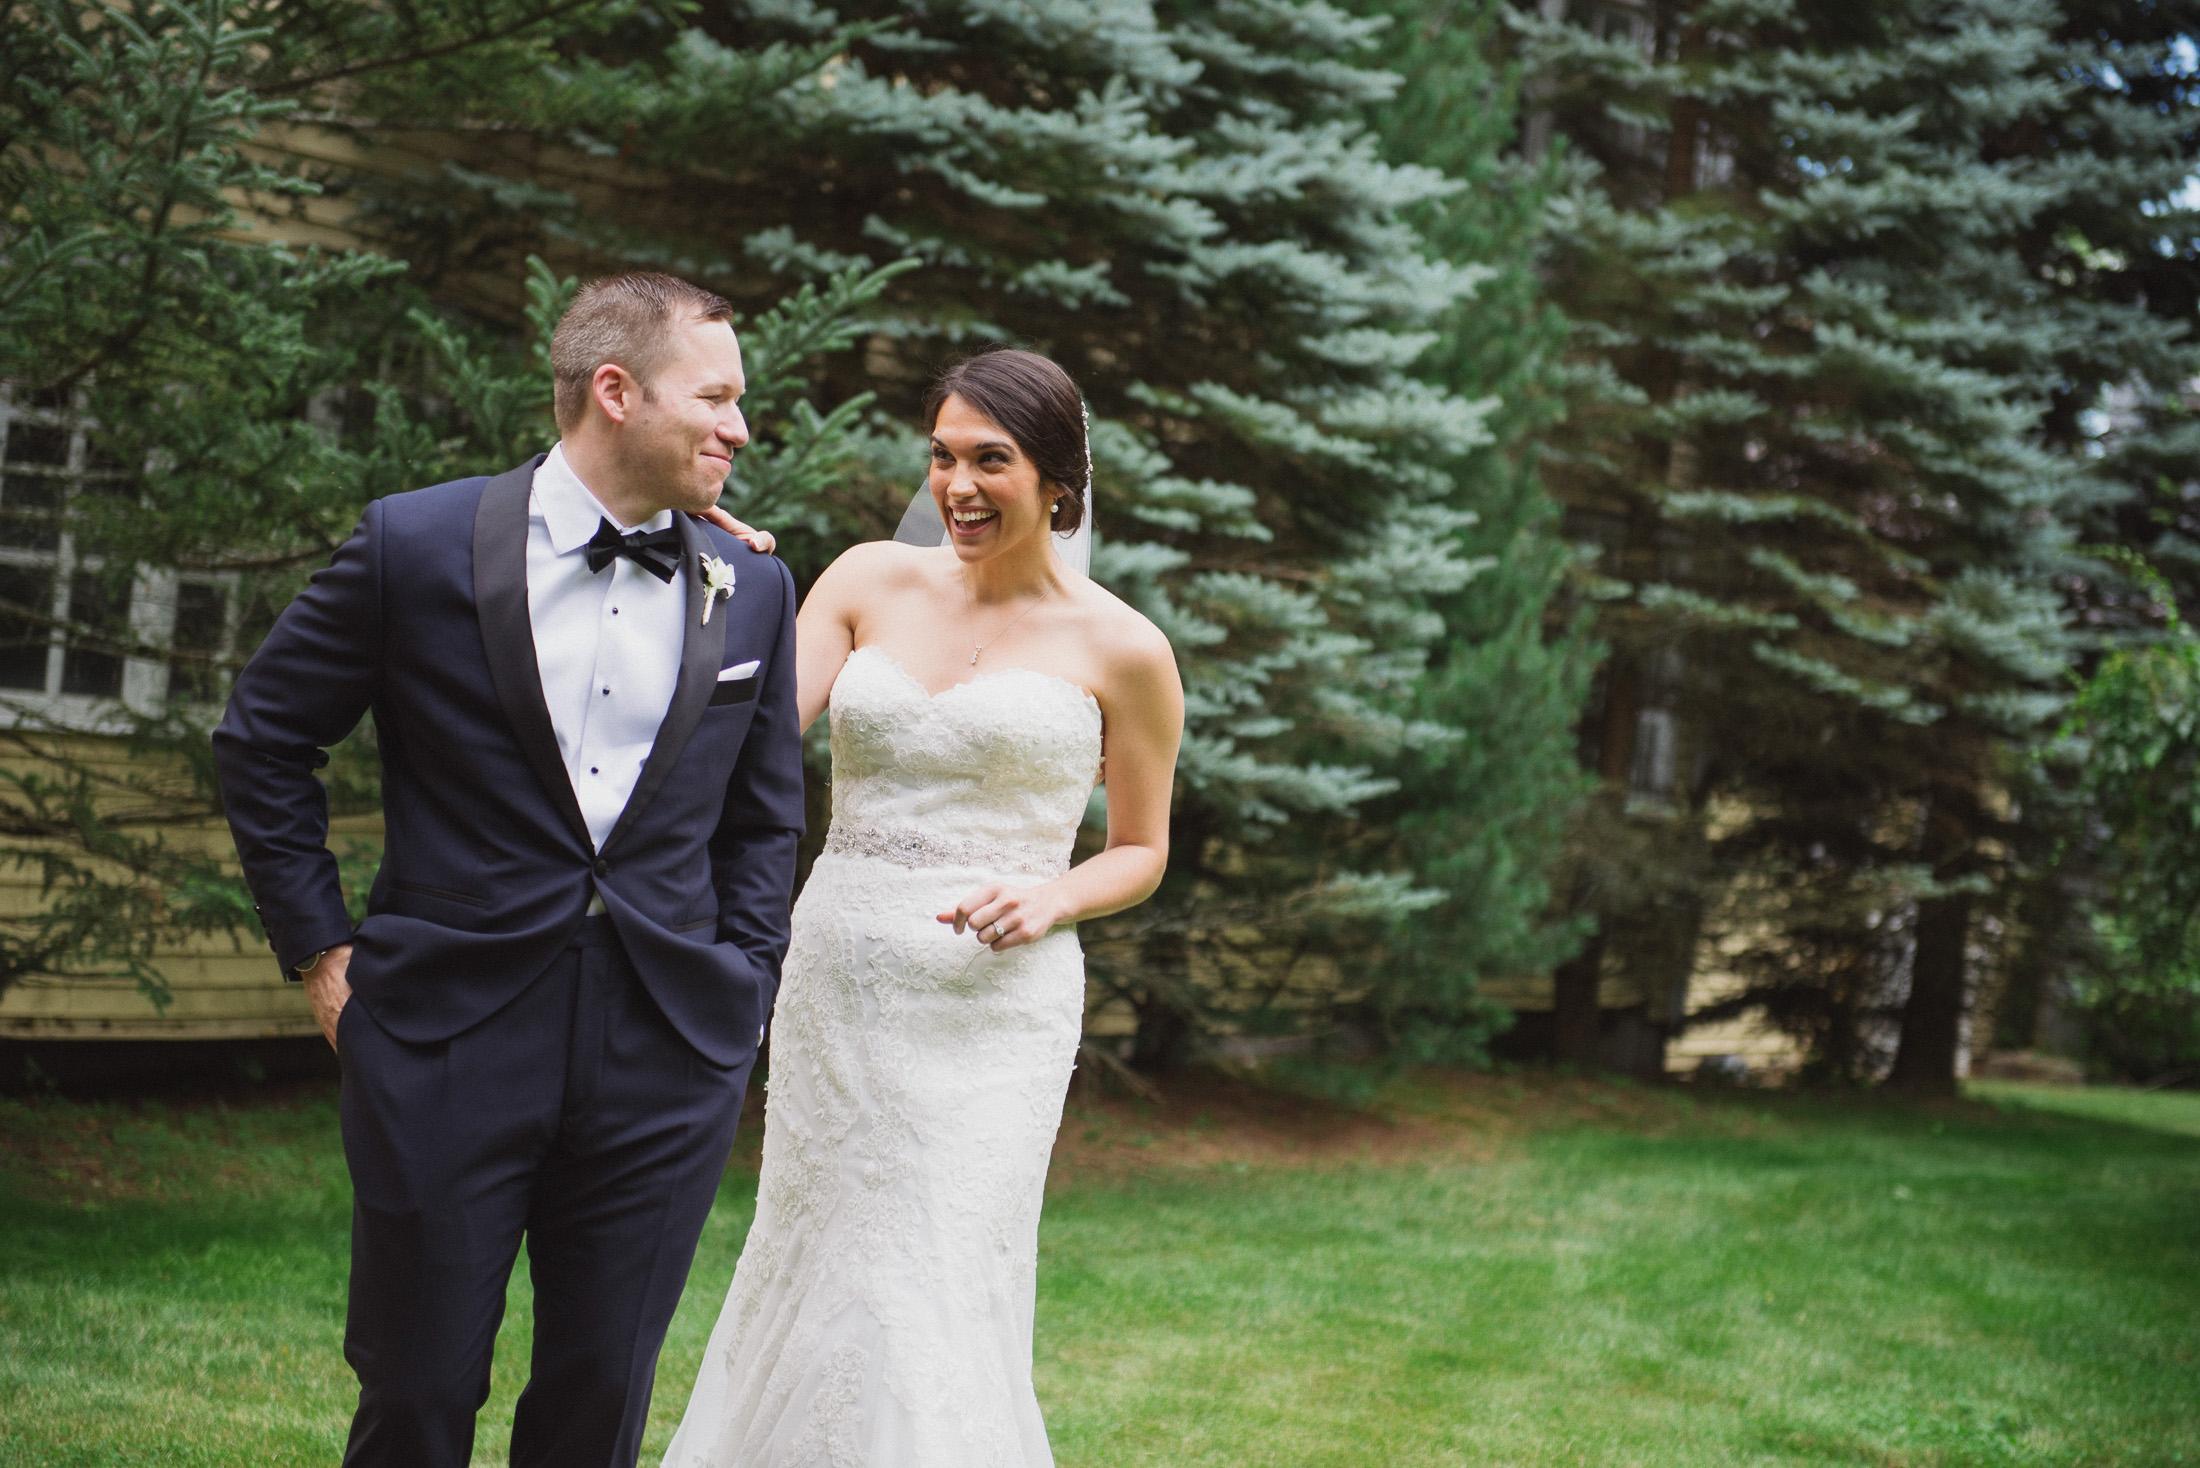 NH Wedding Photographer: first look at Bedford Village Inn